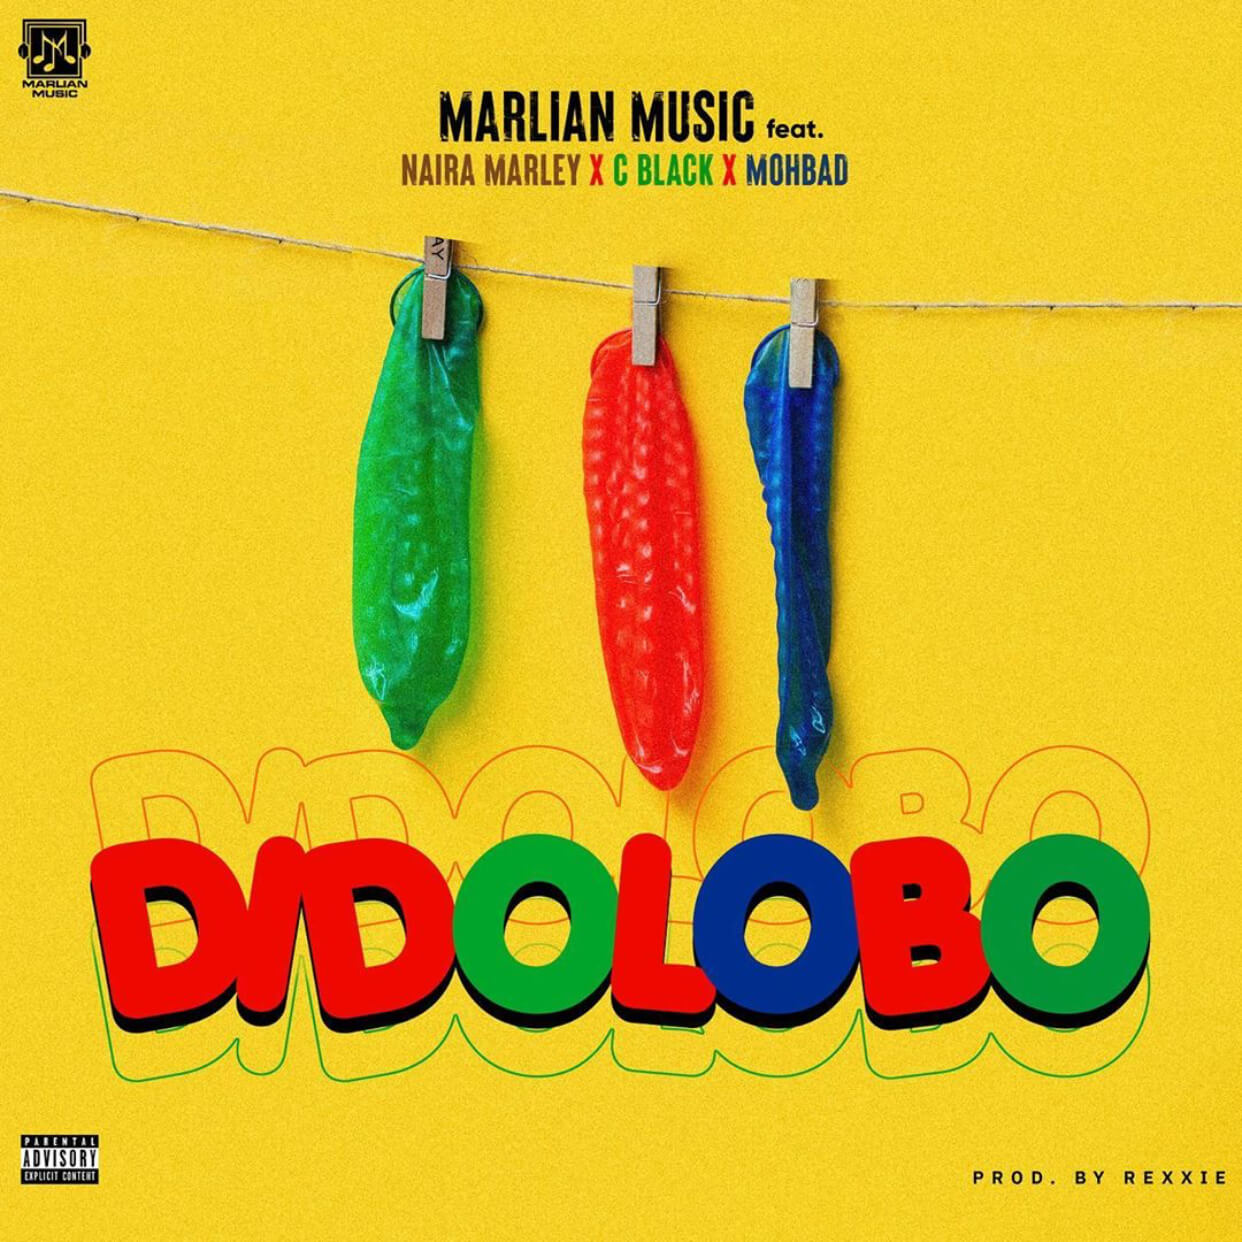 Naira Marley X C Black X Mohbad - Dido Lobo